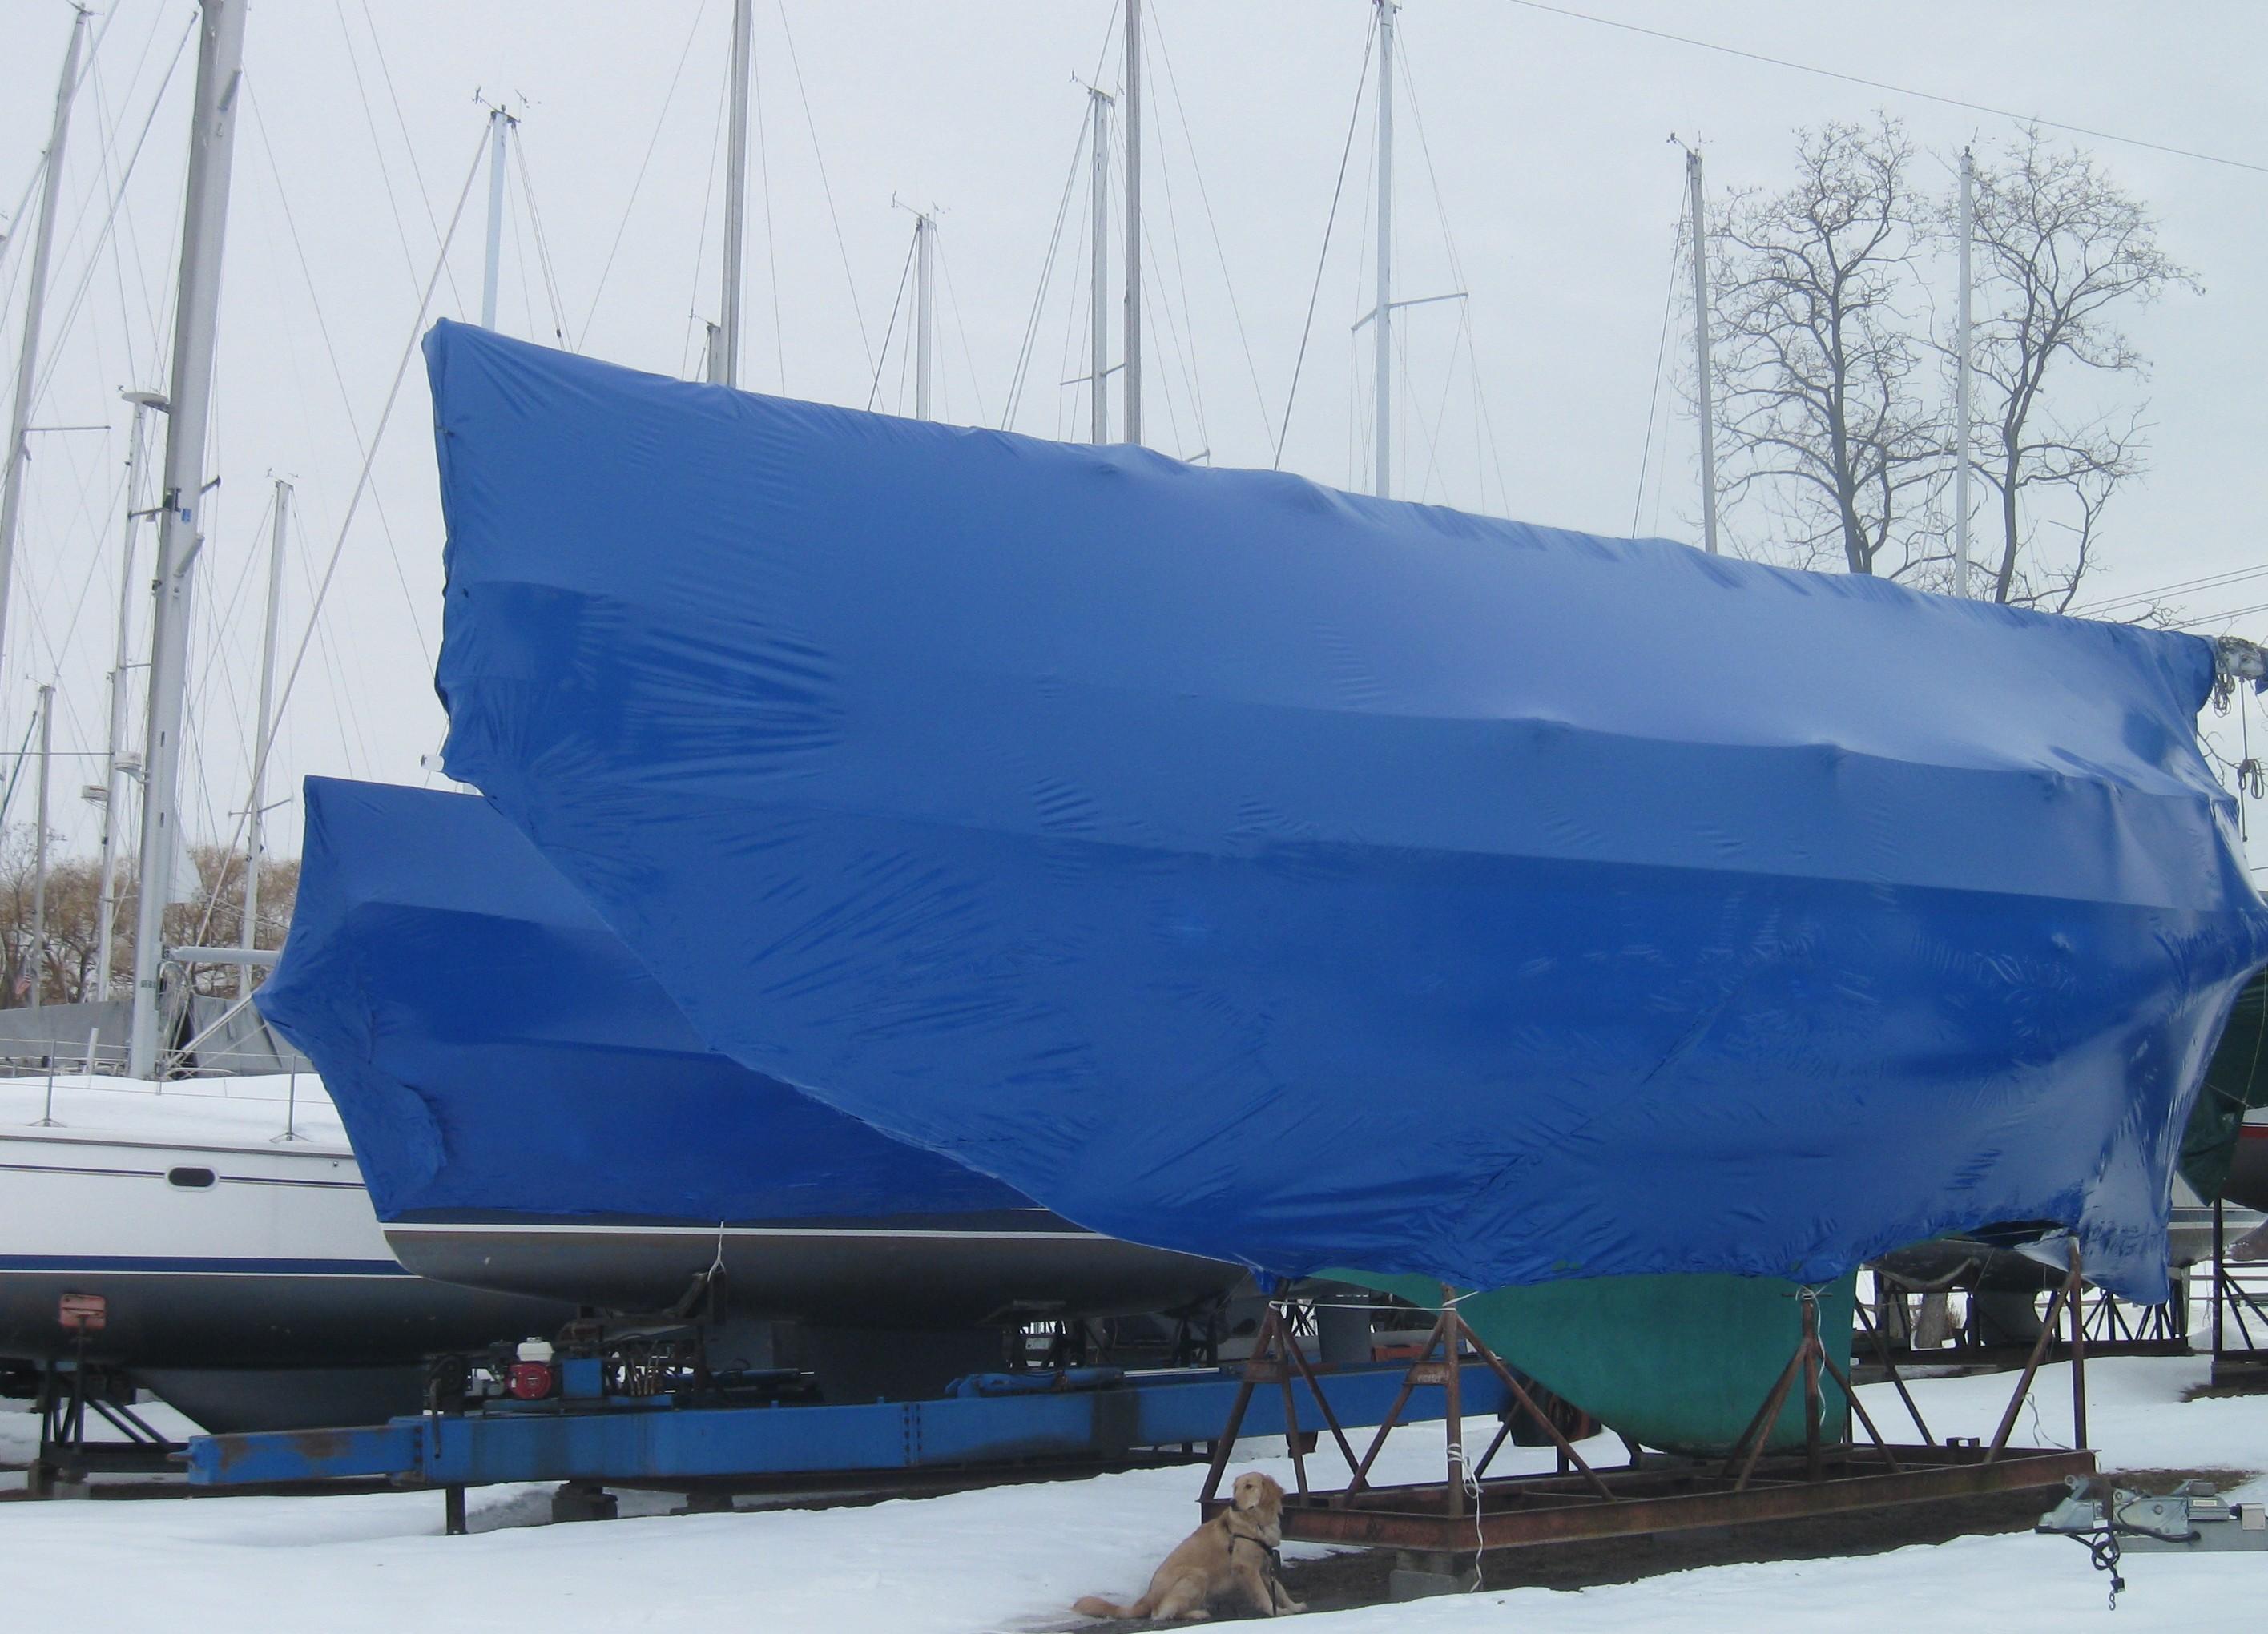 Golden Retriever under sail boat